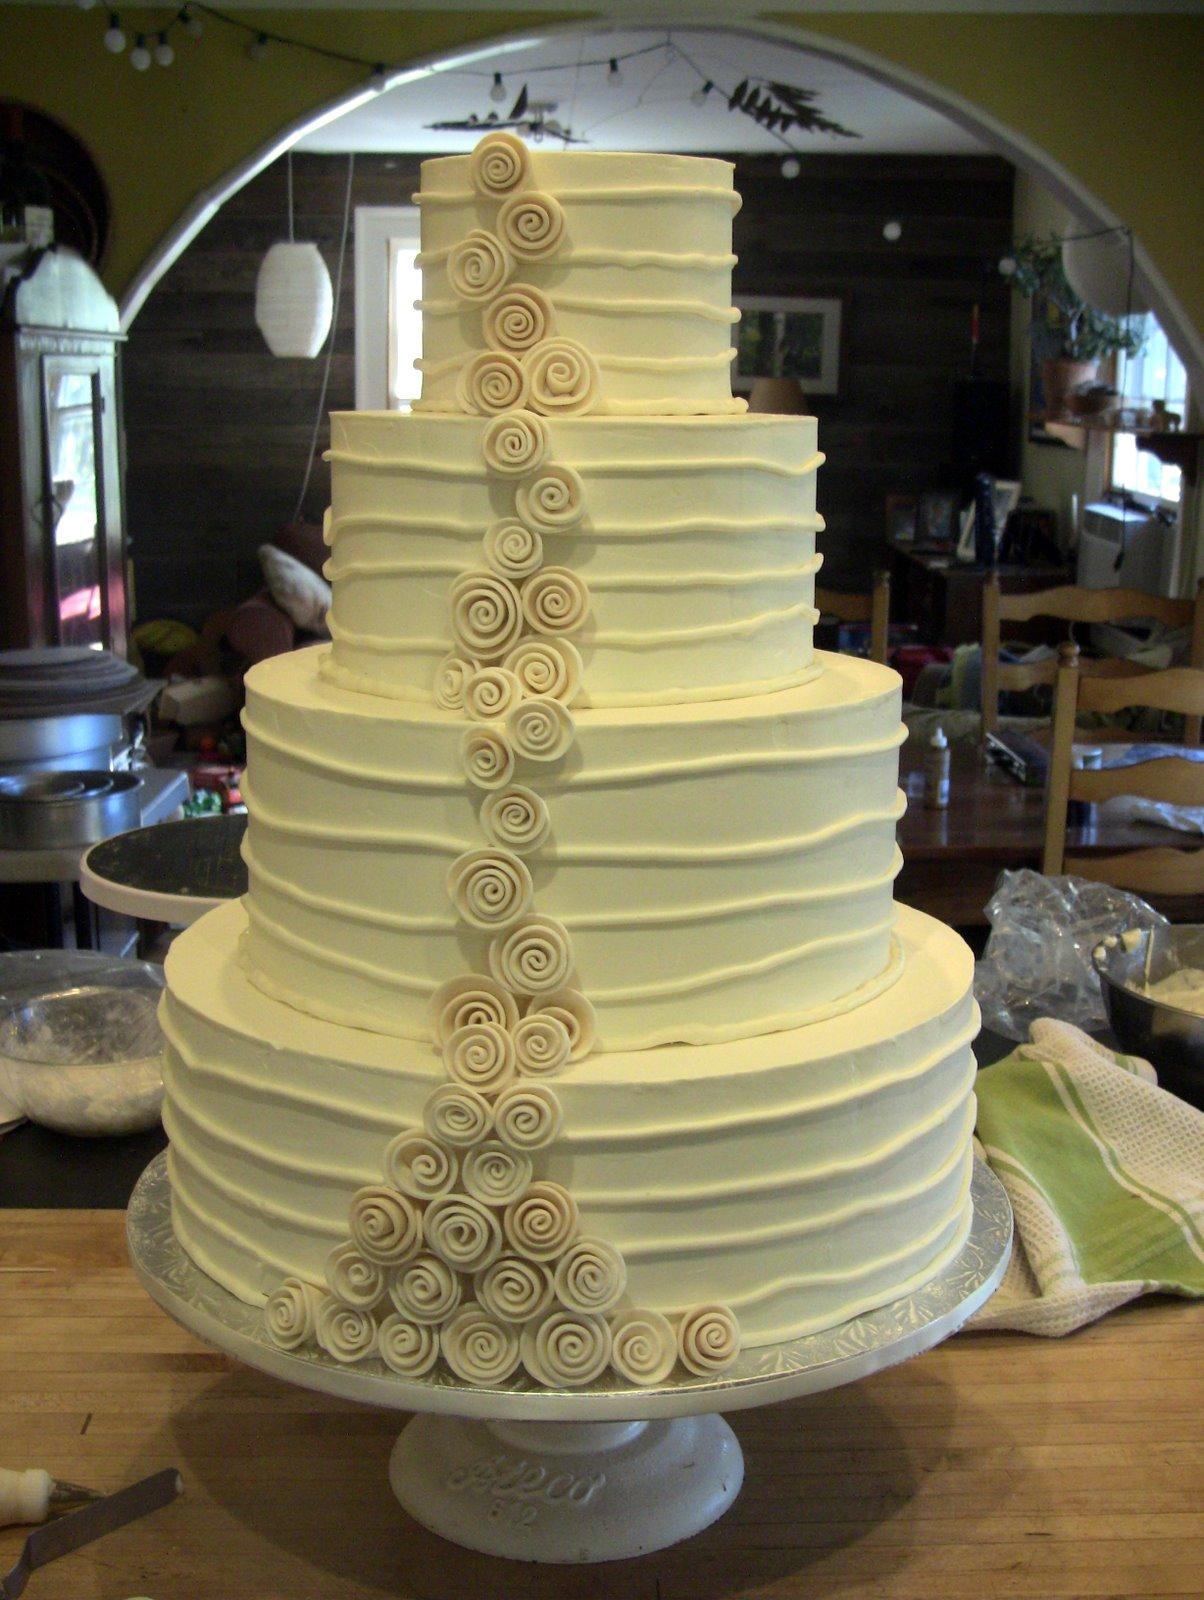 CAKE SAFE | Cakes by Rachel